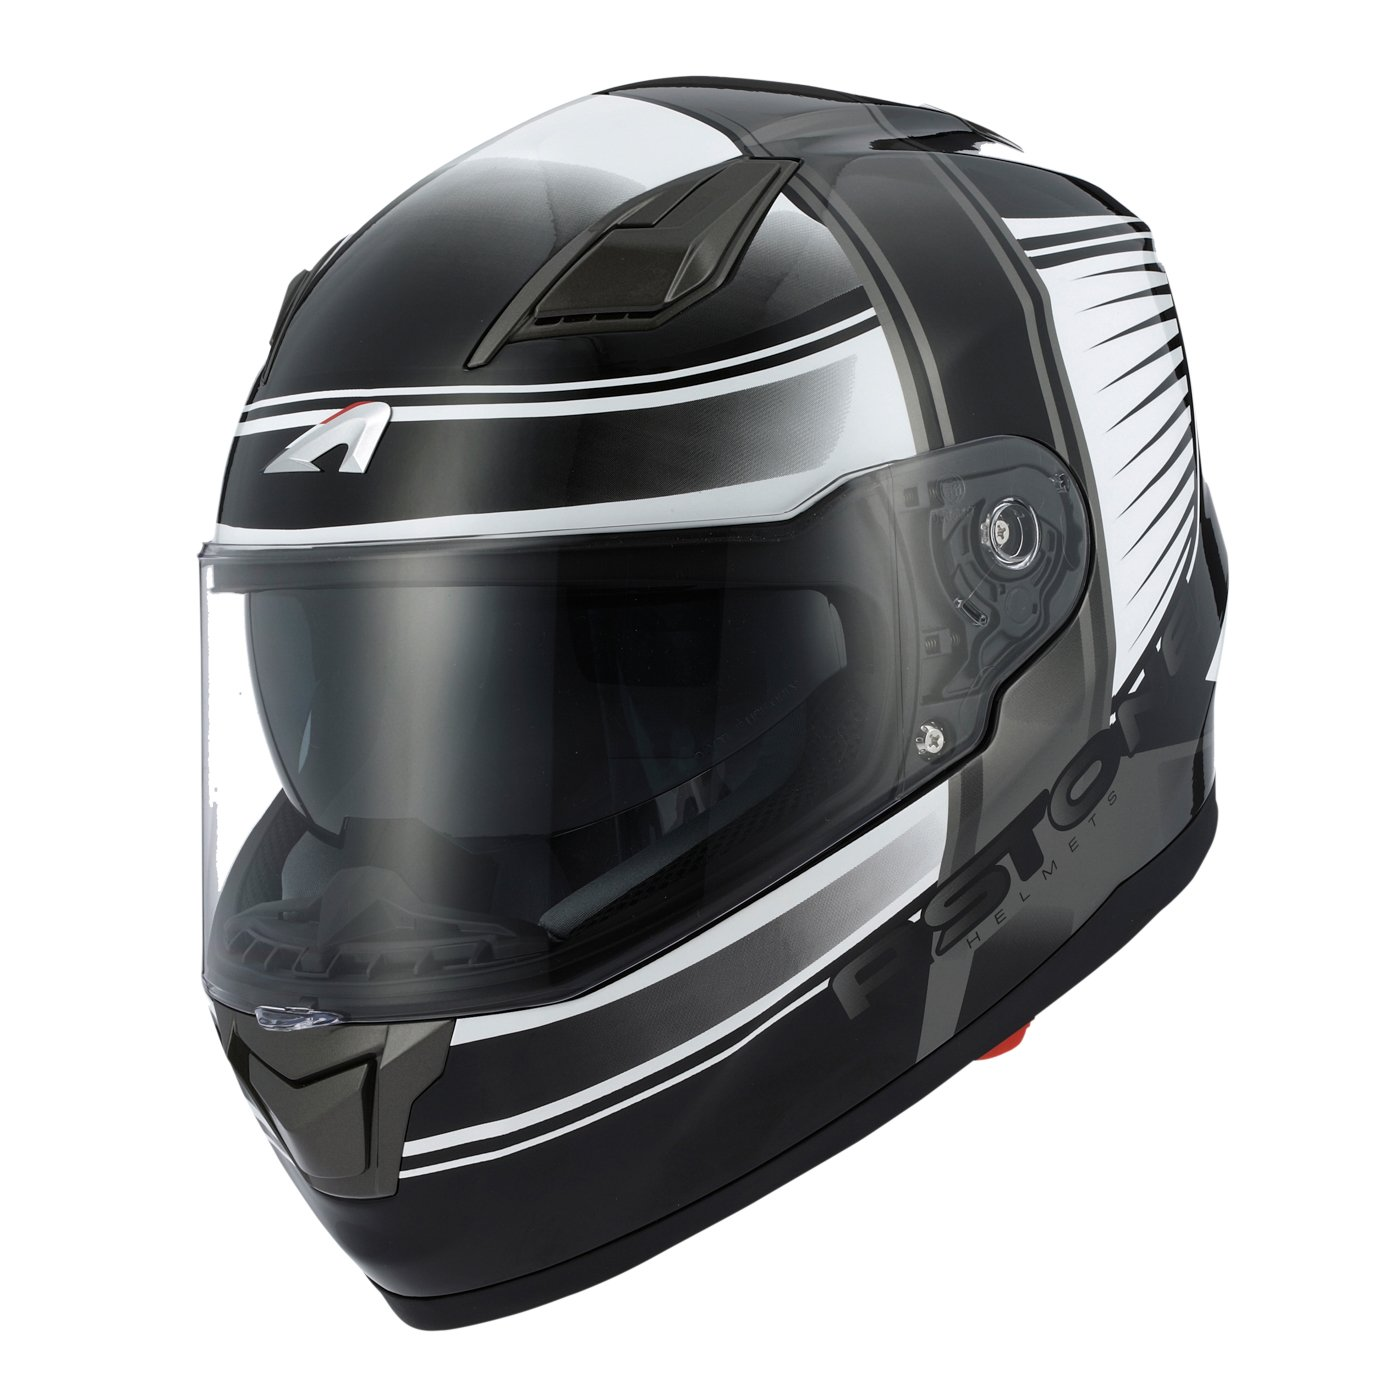 Astone Helmets Casque Moto Inté gral GT900, Noir/Rouge, Taille S Rider Valley GT900-COR-RDS